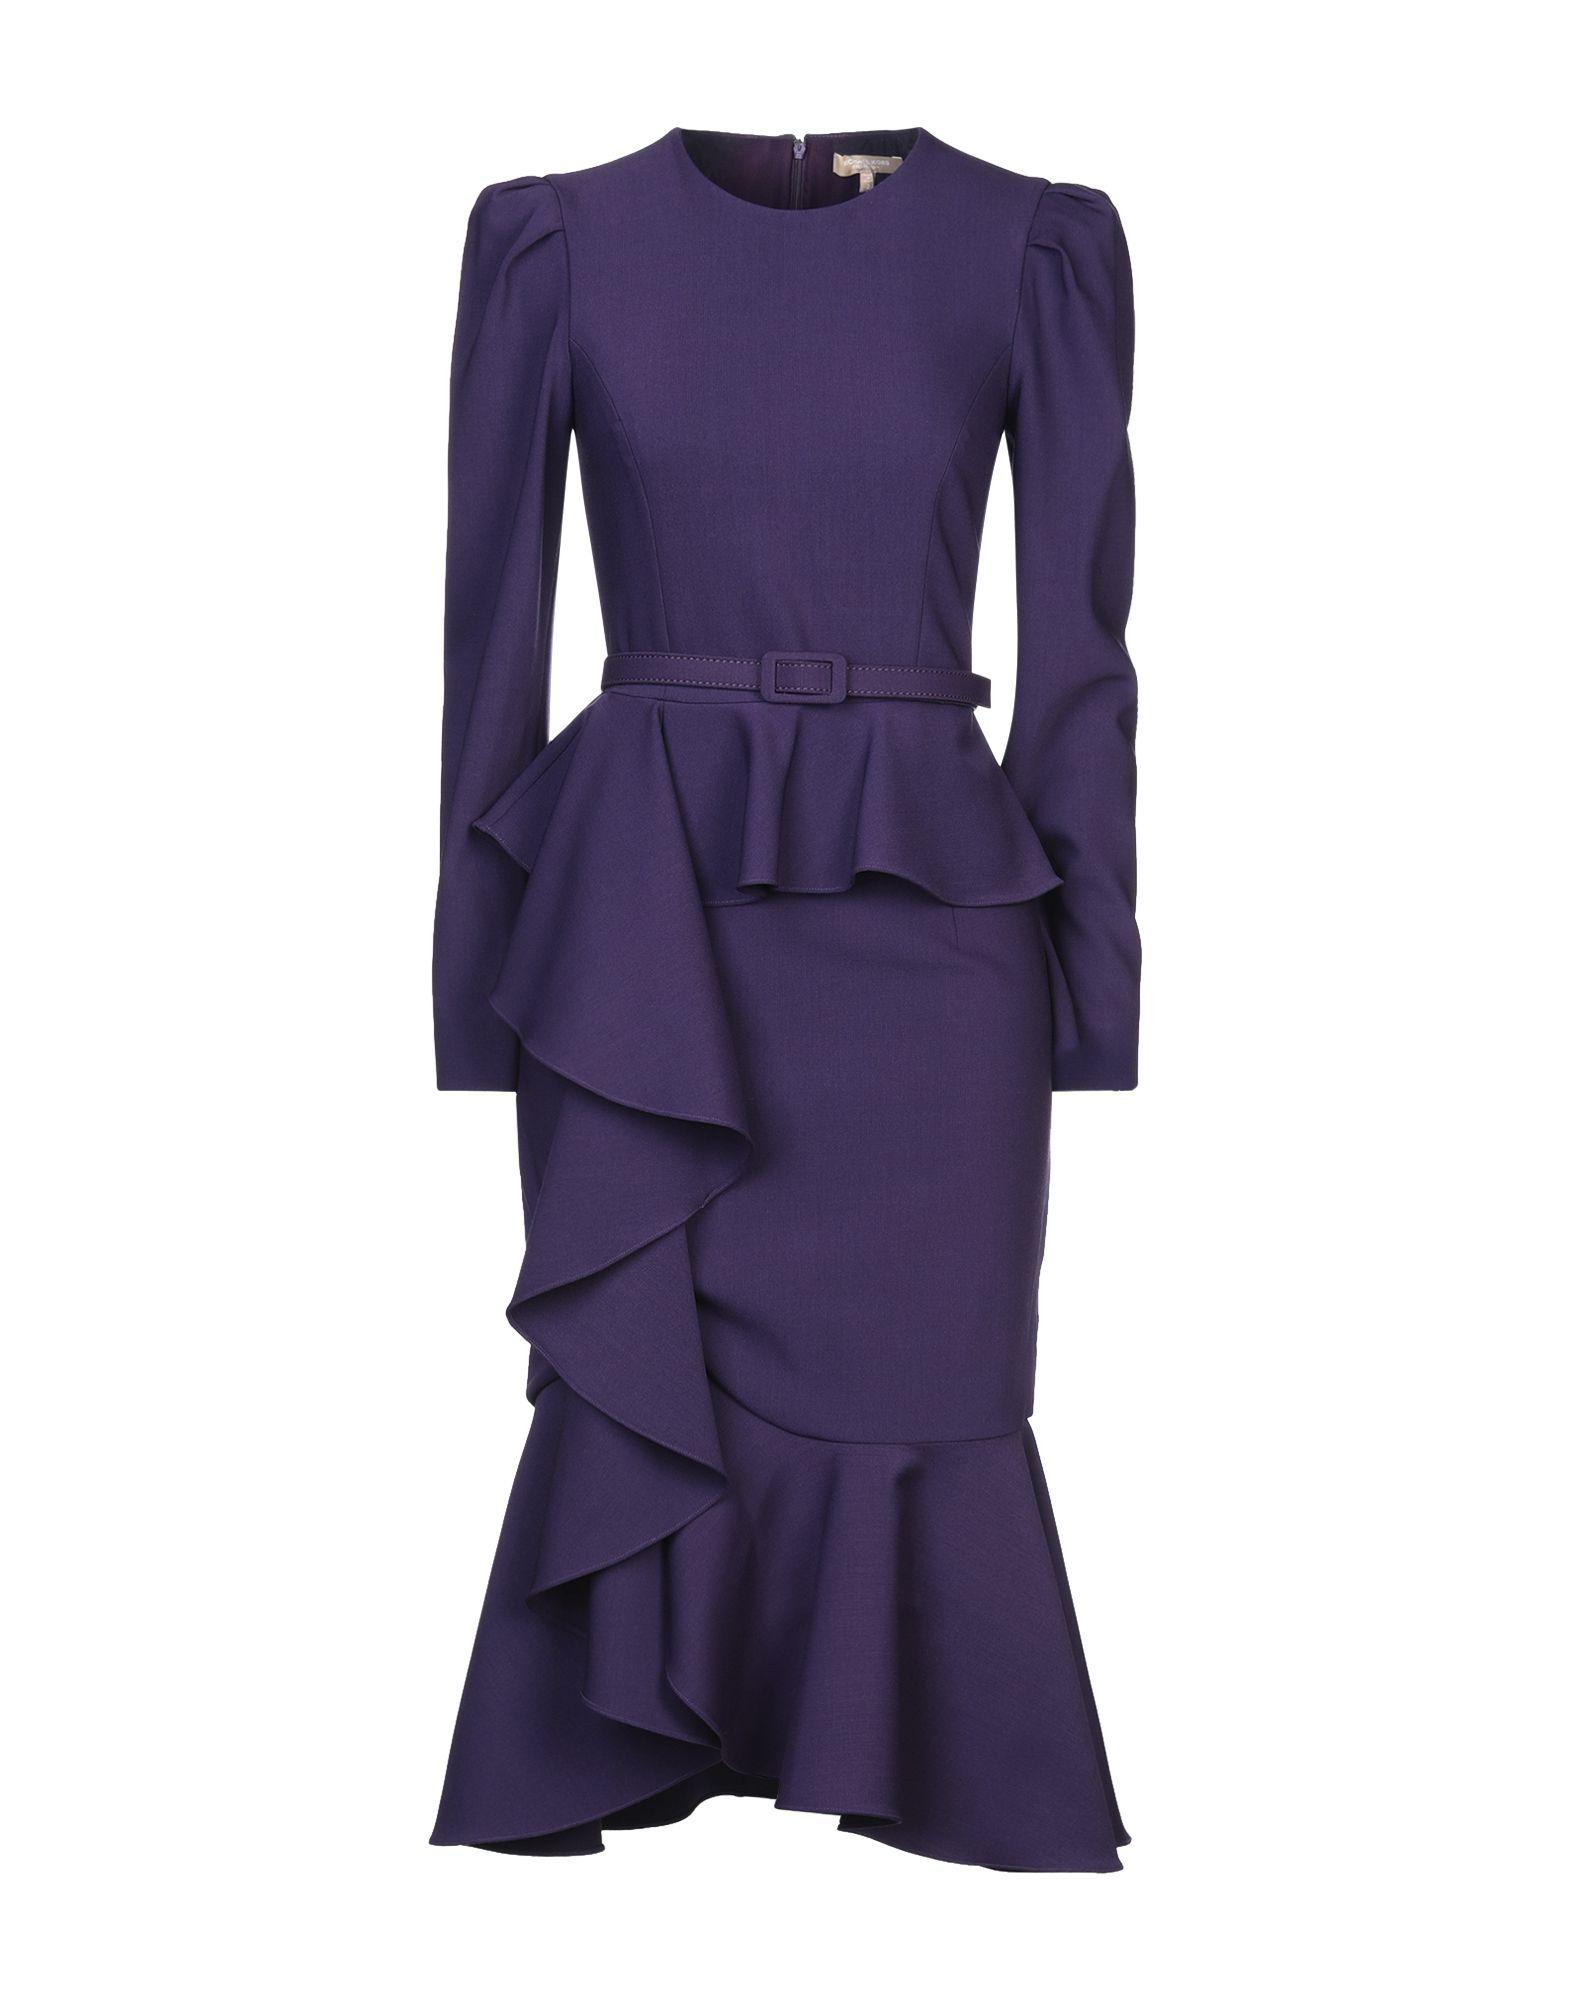 MICHAEL KORS COLLECTION Платье до колена